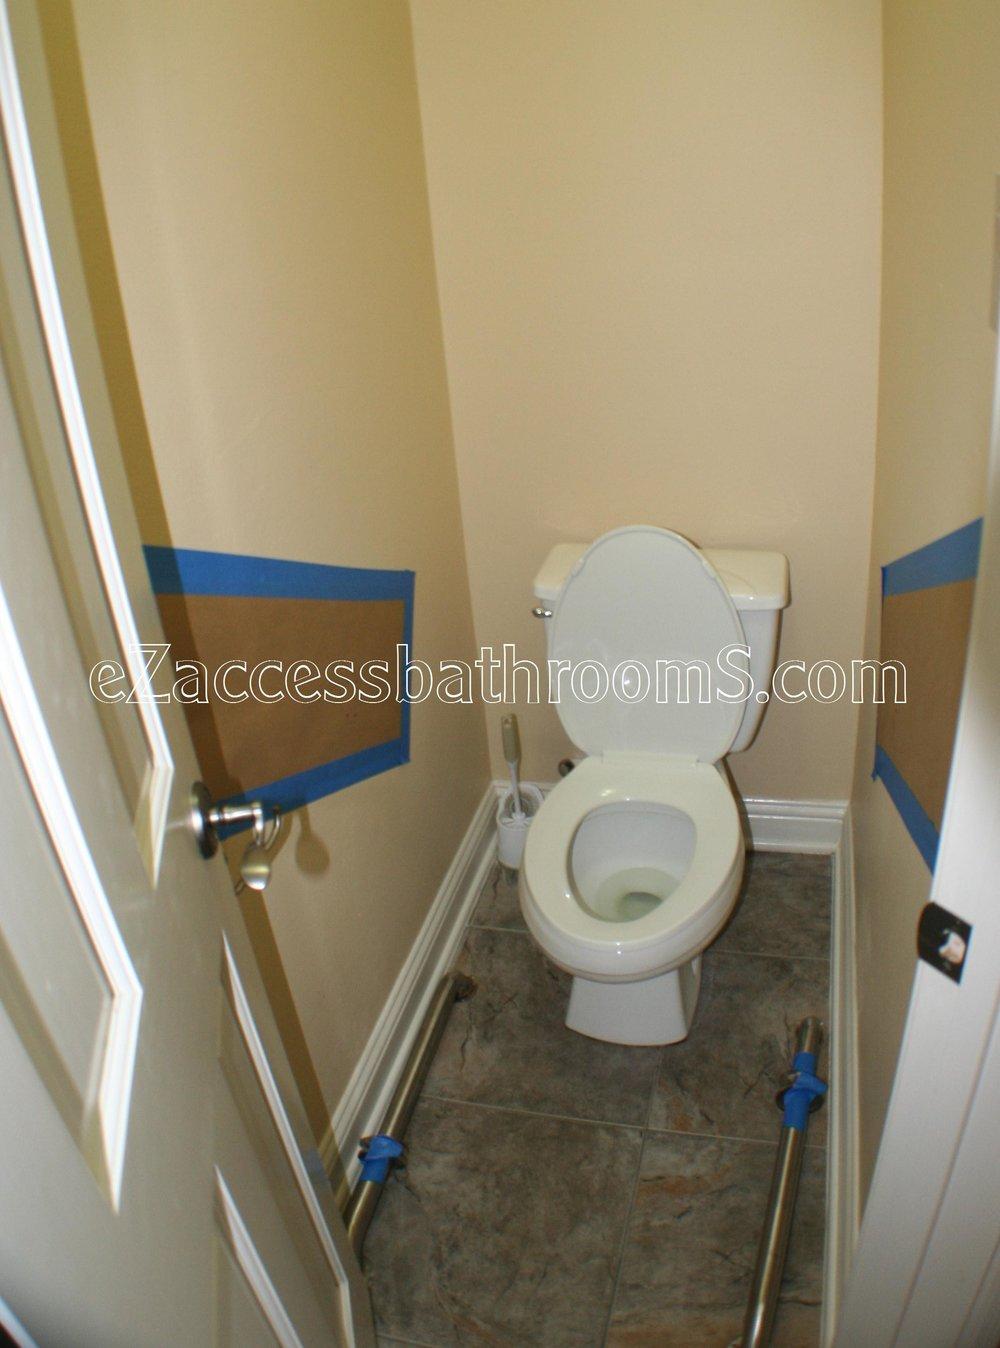 toilet grab bars installation houston 007.JPG